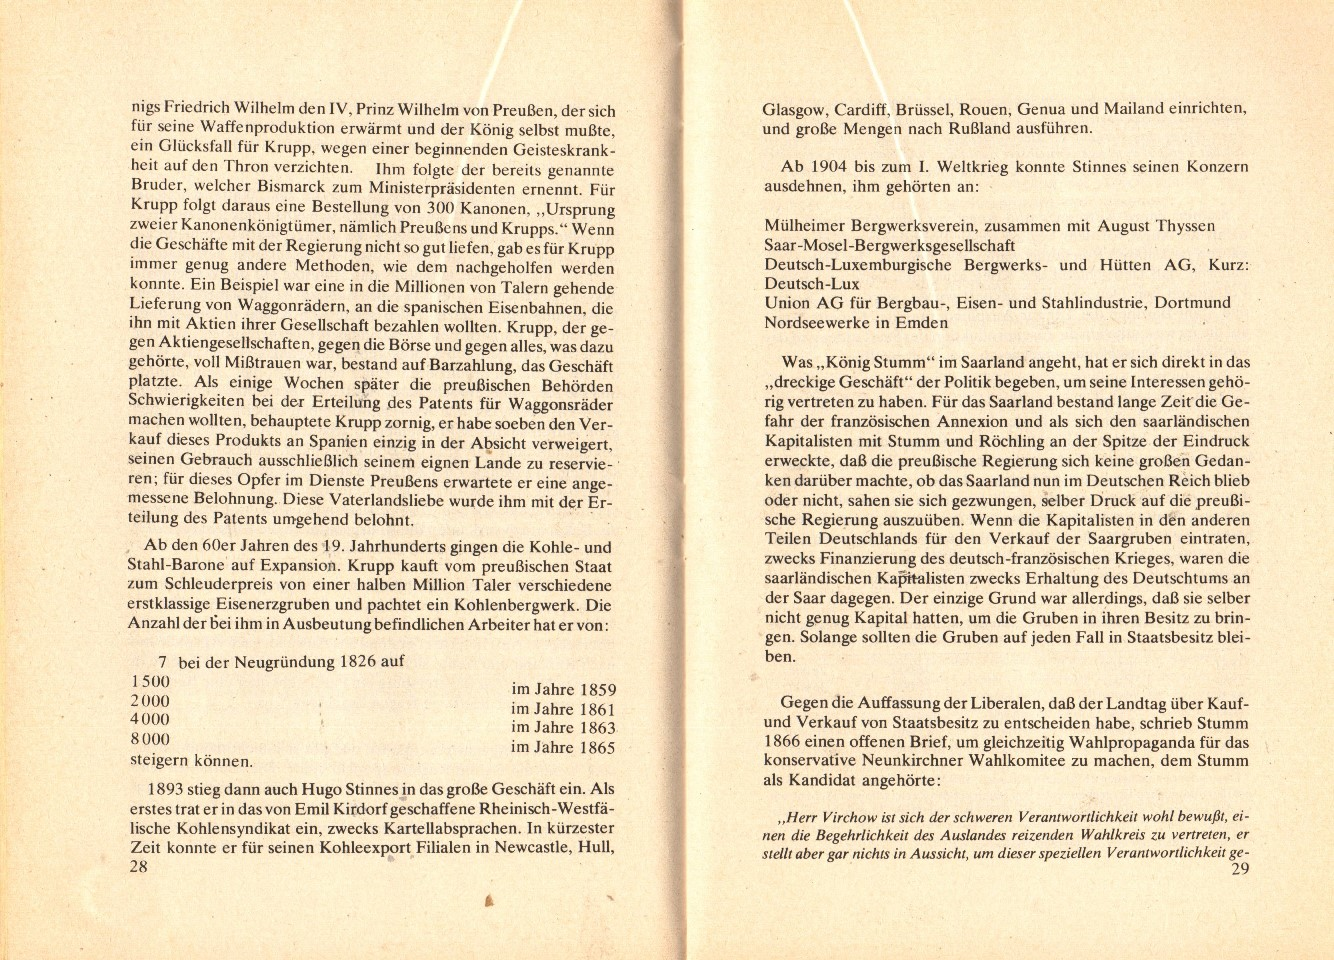 NRW_KBW_1977_Politik_der_Kohle_u_Stahlbarone_15